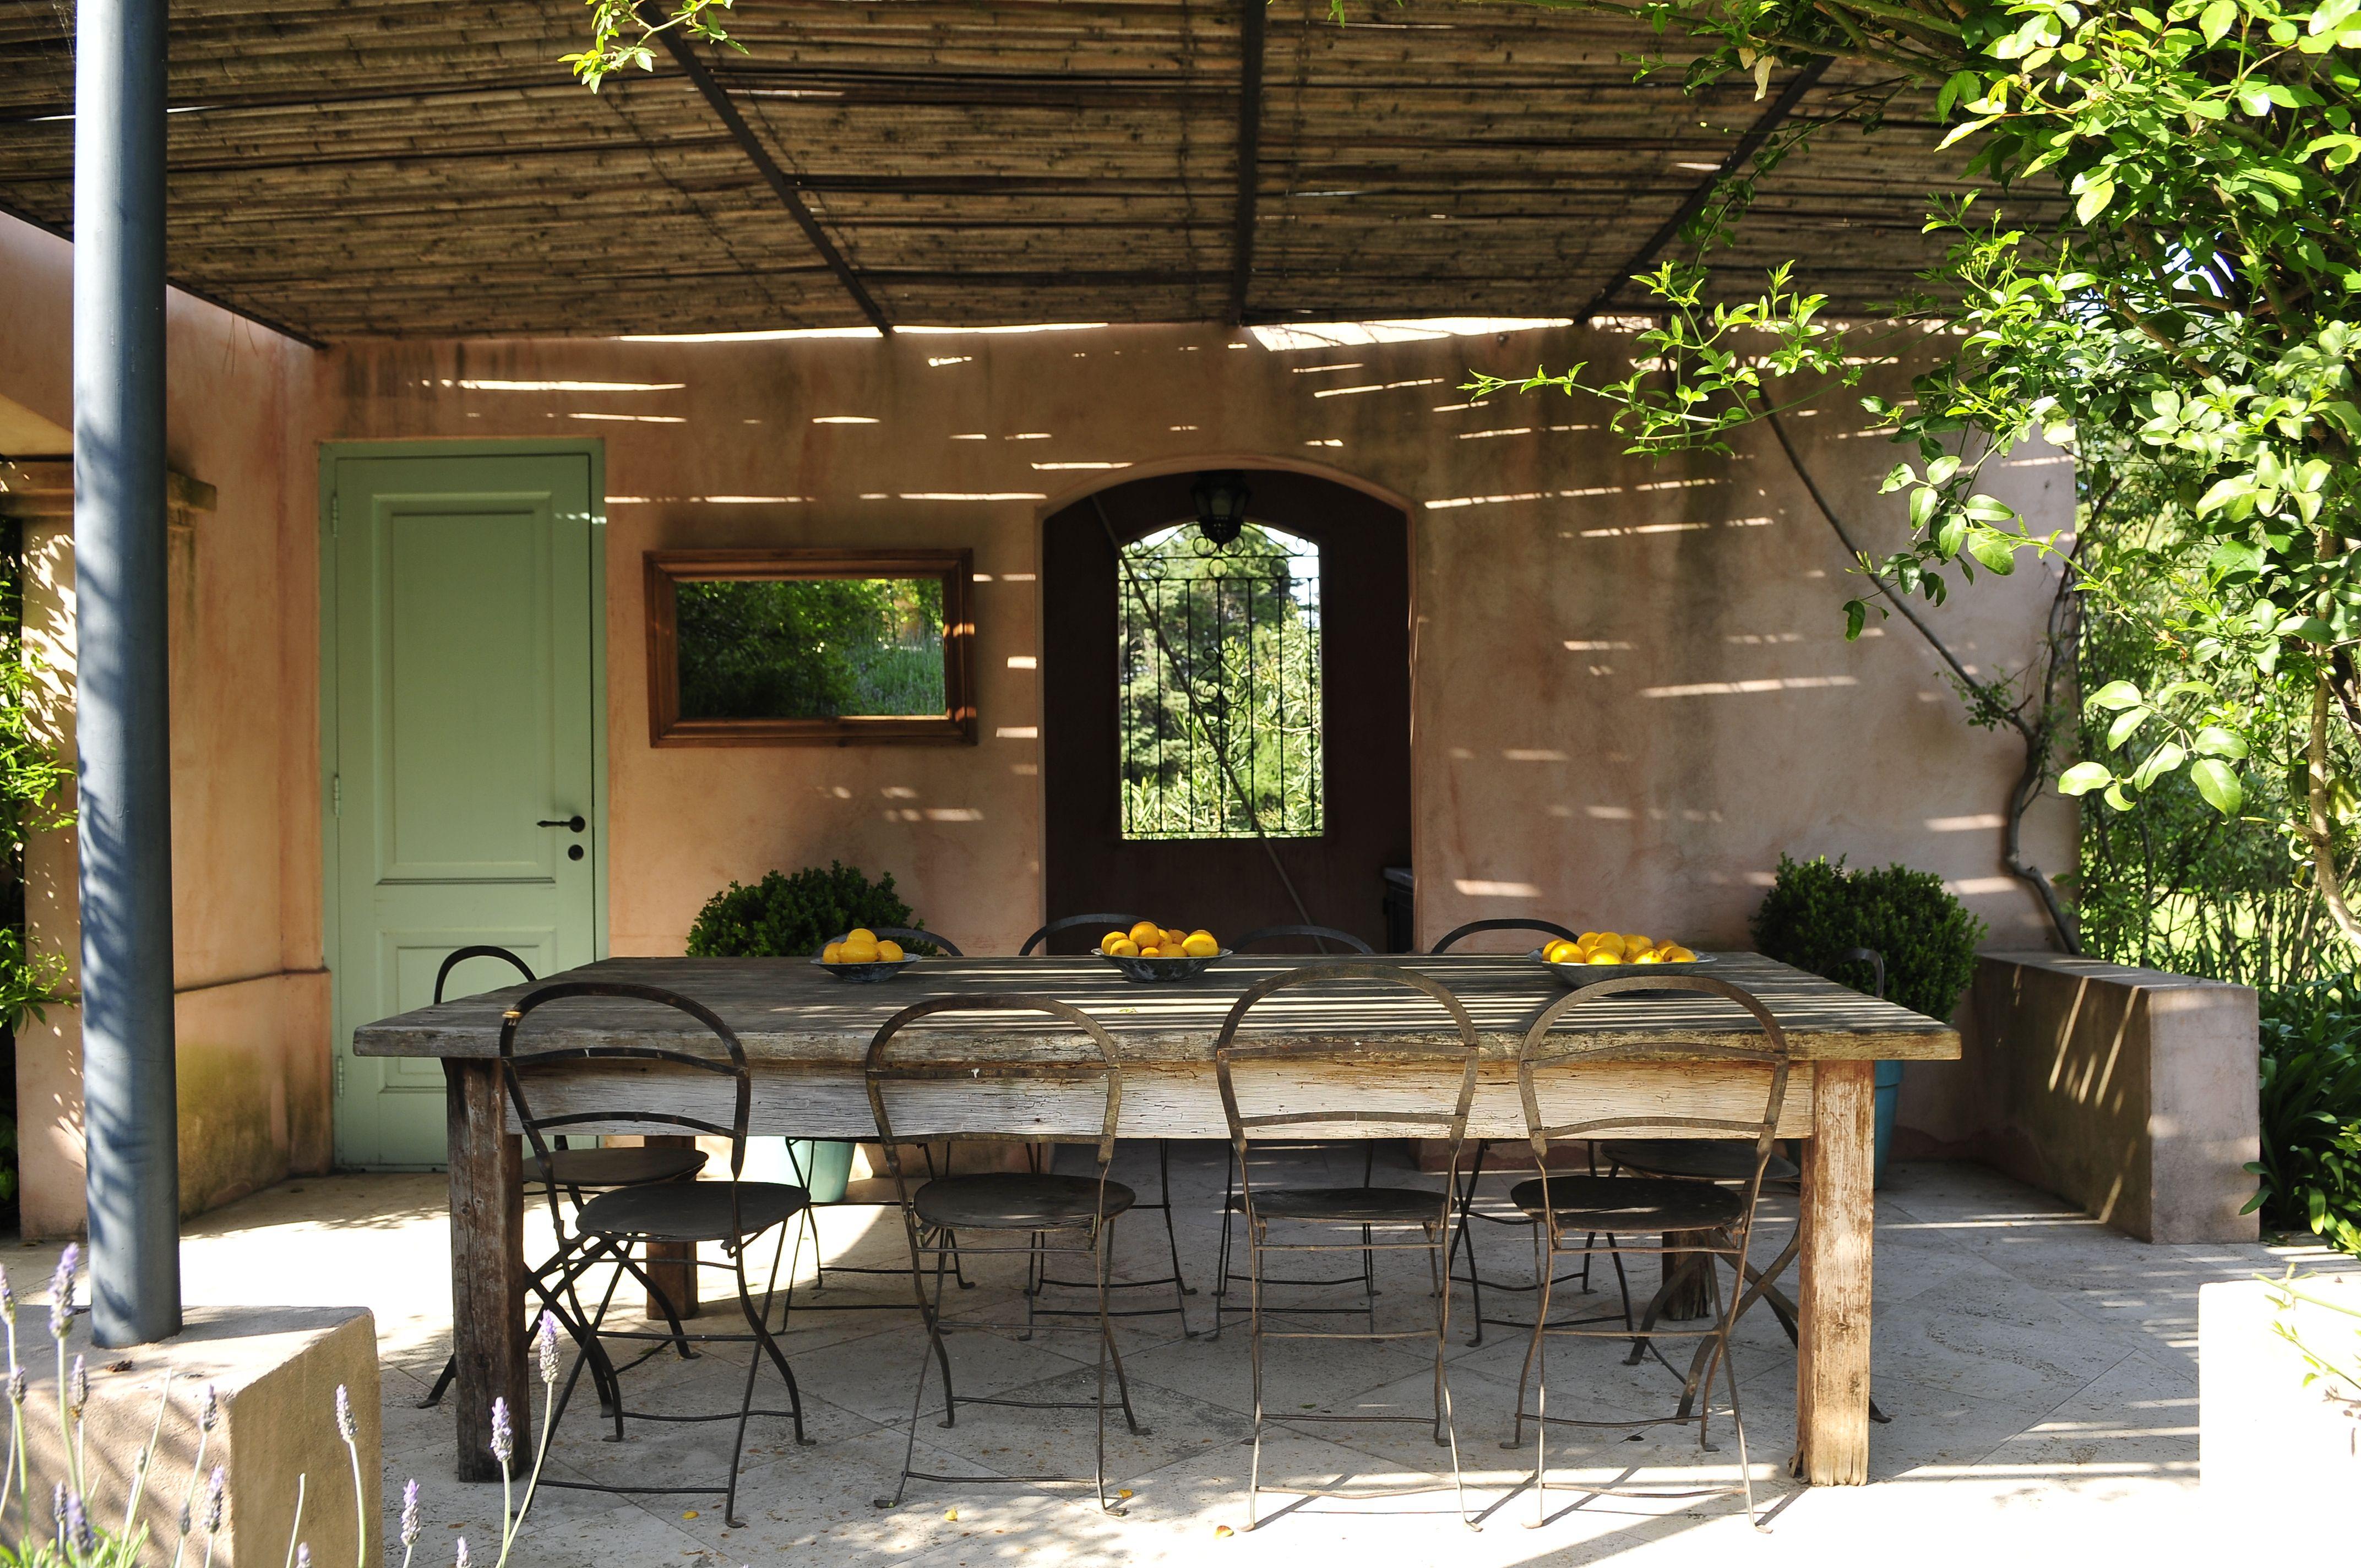 Arquitectura paisajismo ricardo pereyra iraola for Casa silvia muebles y colchones olavarria buenos aires